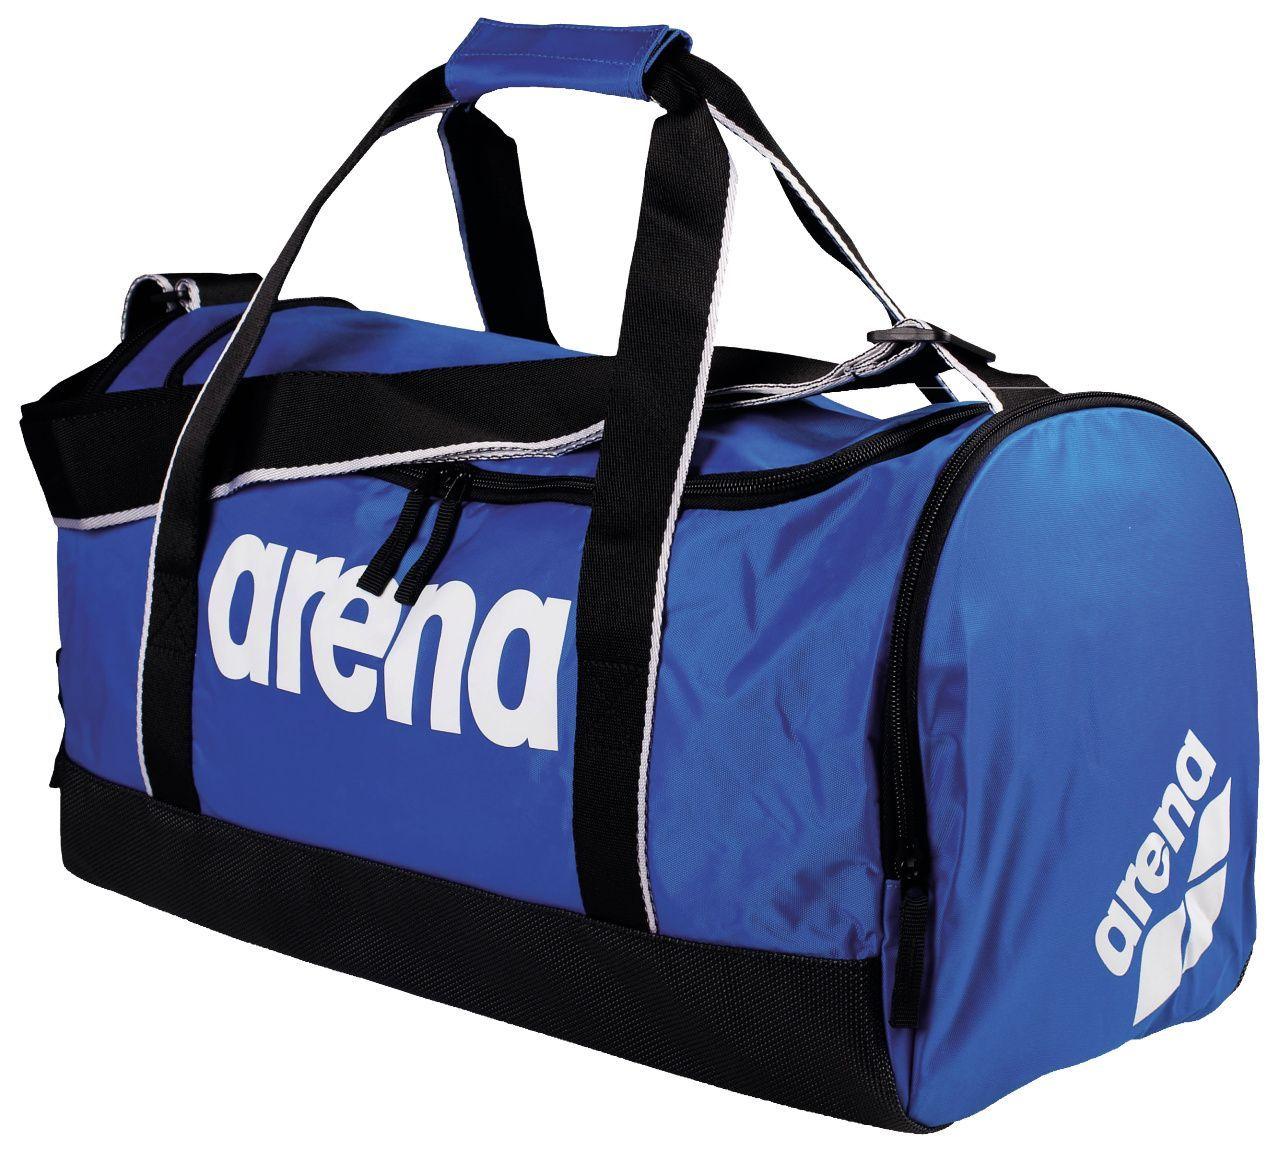 Arena Spiky 2 Medium Holdall in Royal Team Blue  41b26432cf